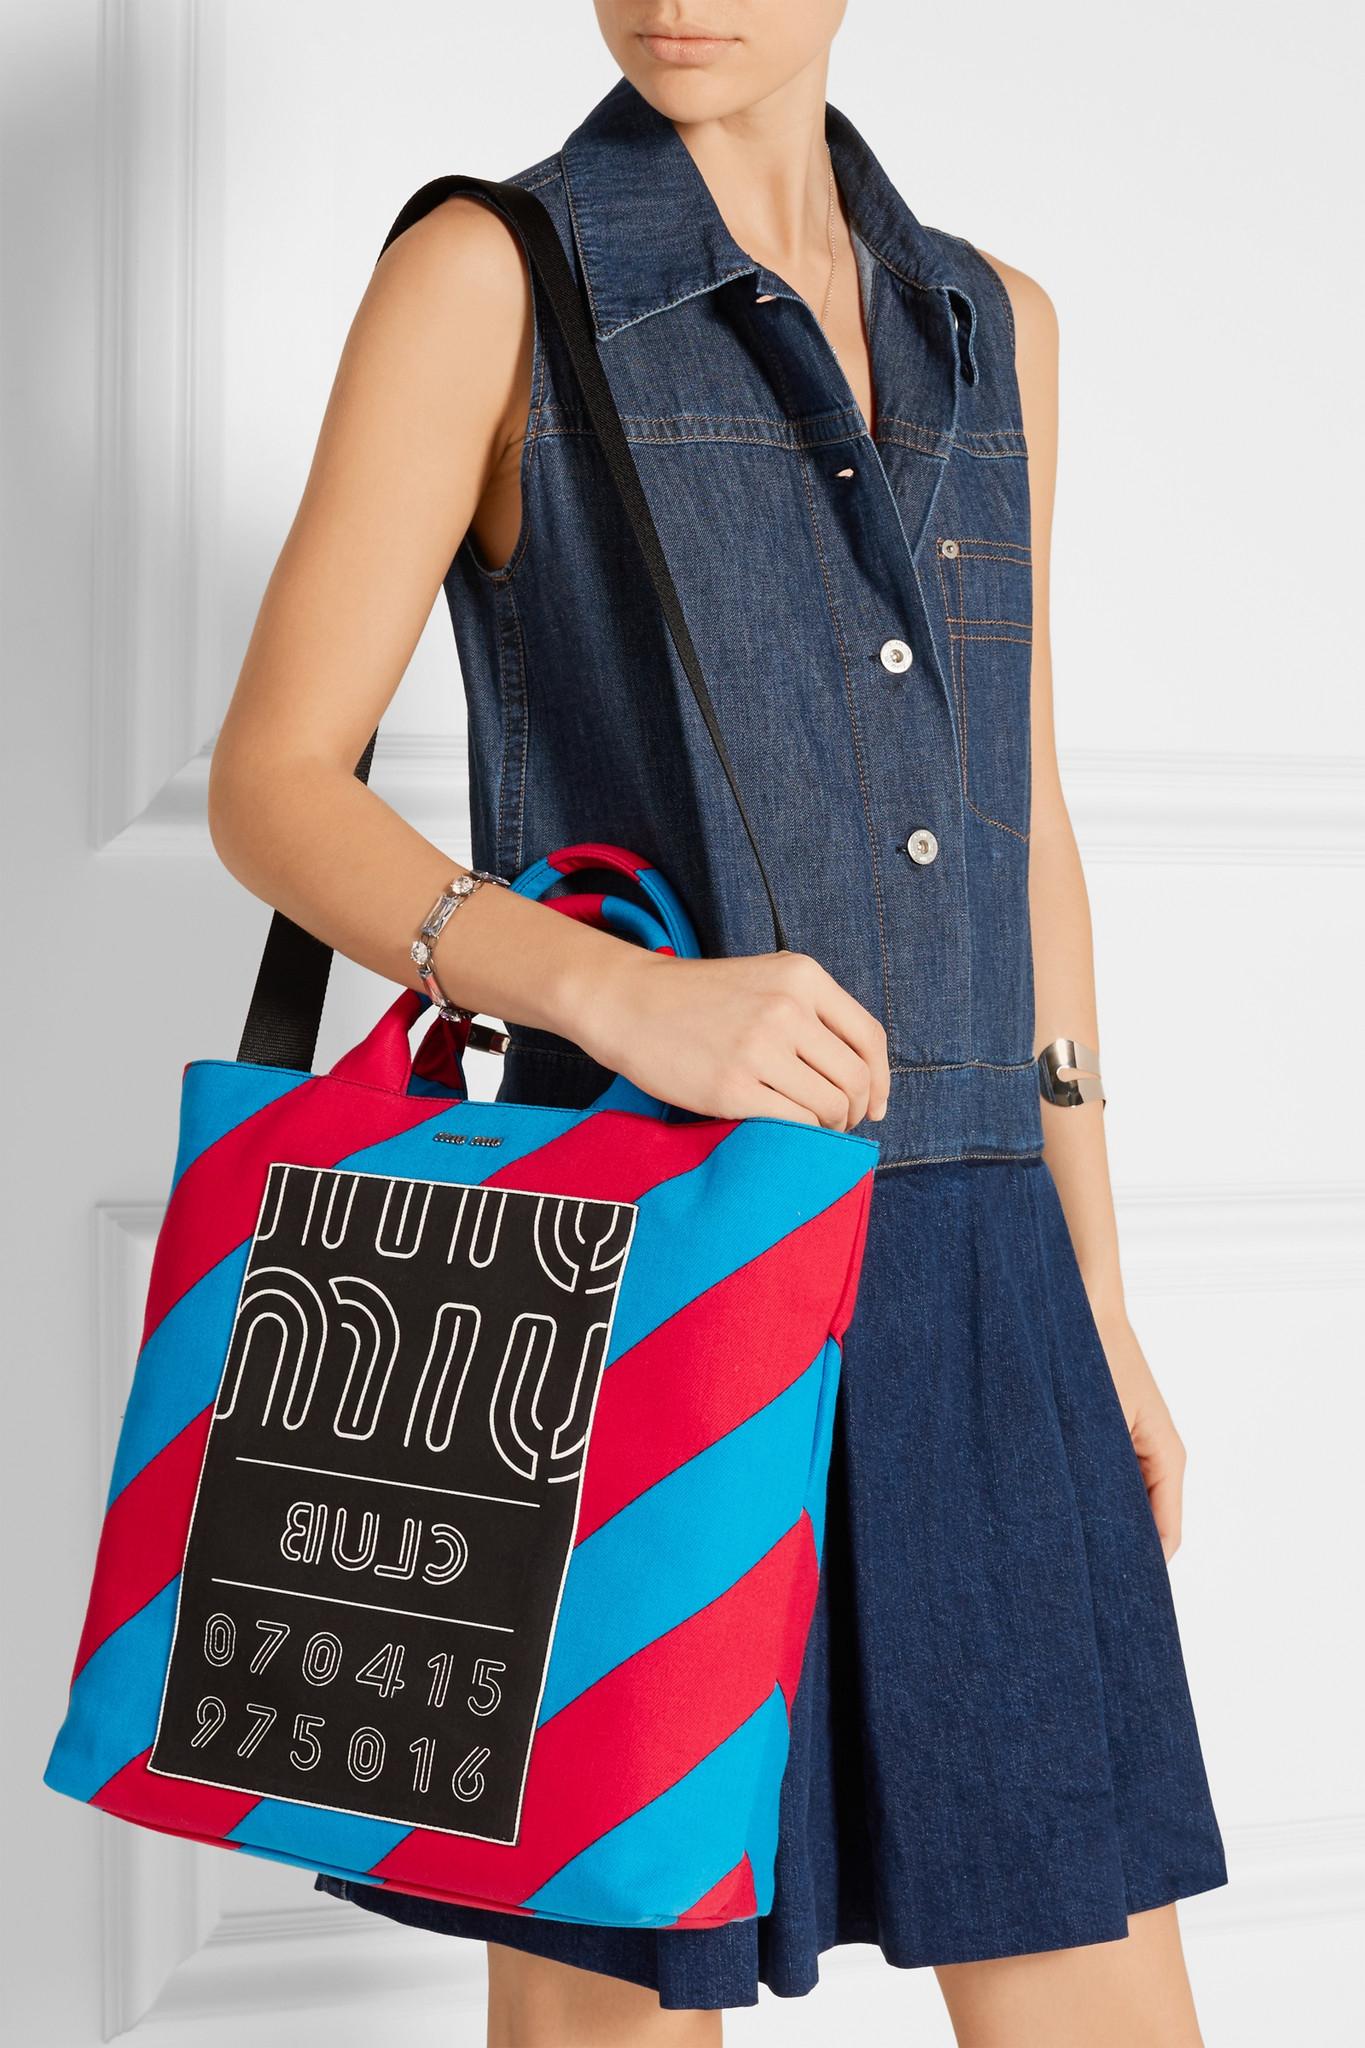 Miu Miu Leather Printed Twill Tote in Blue